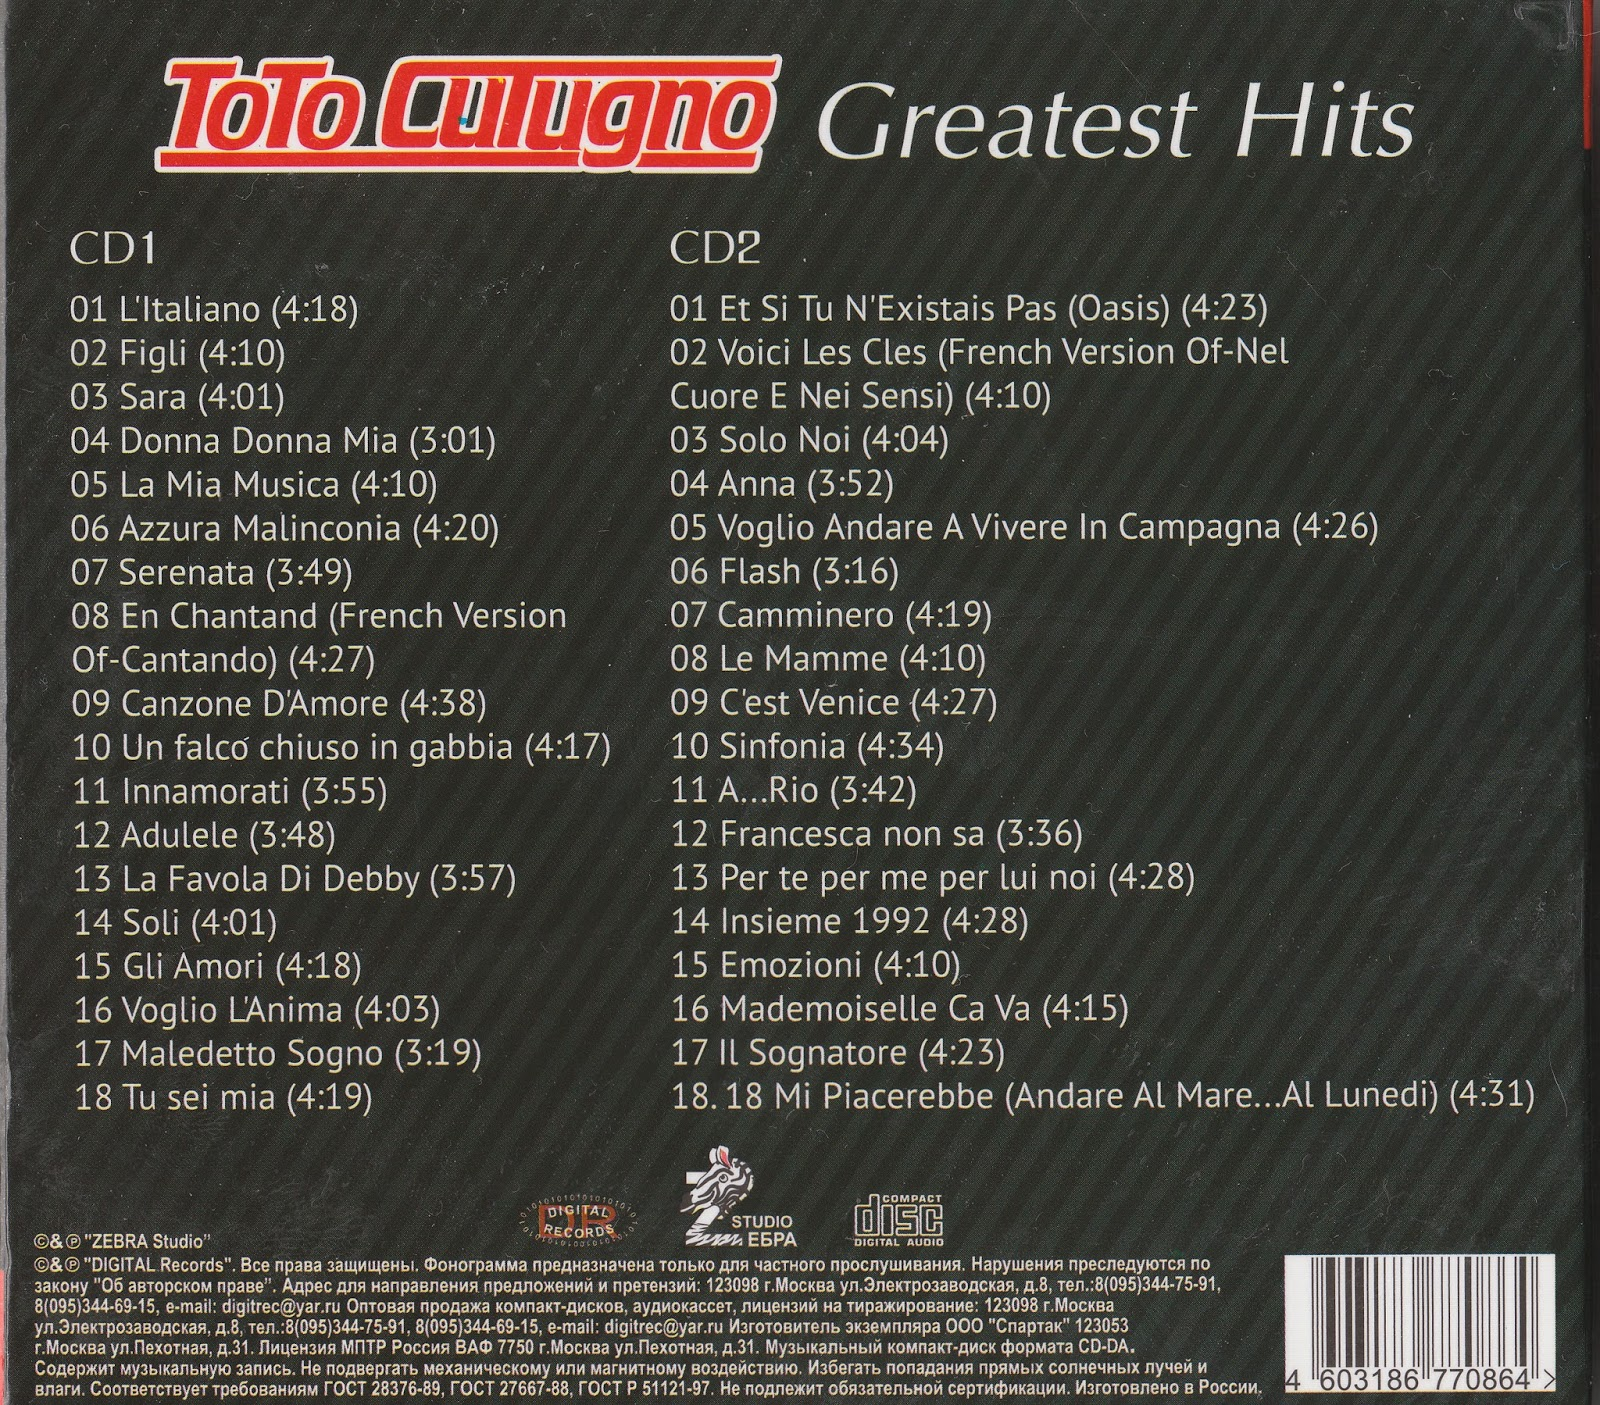 MIJAS: TOTO CUTUGNO - Greatest Hits